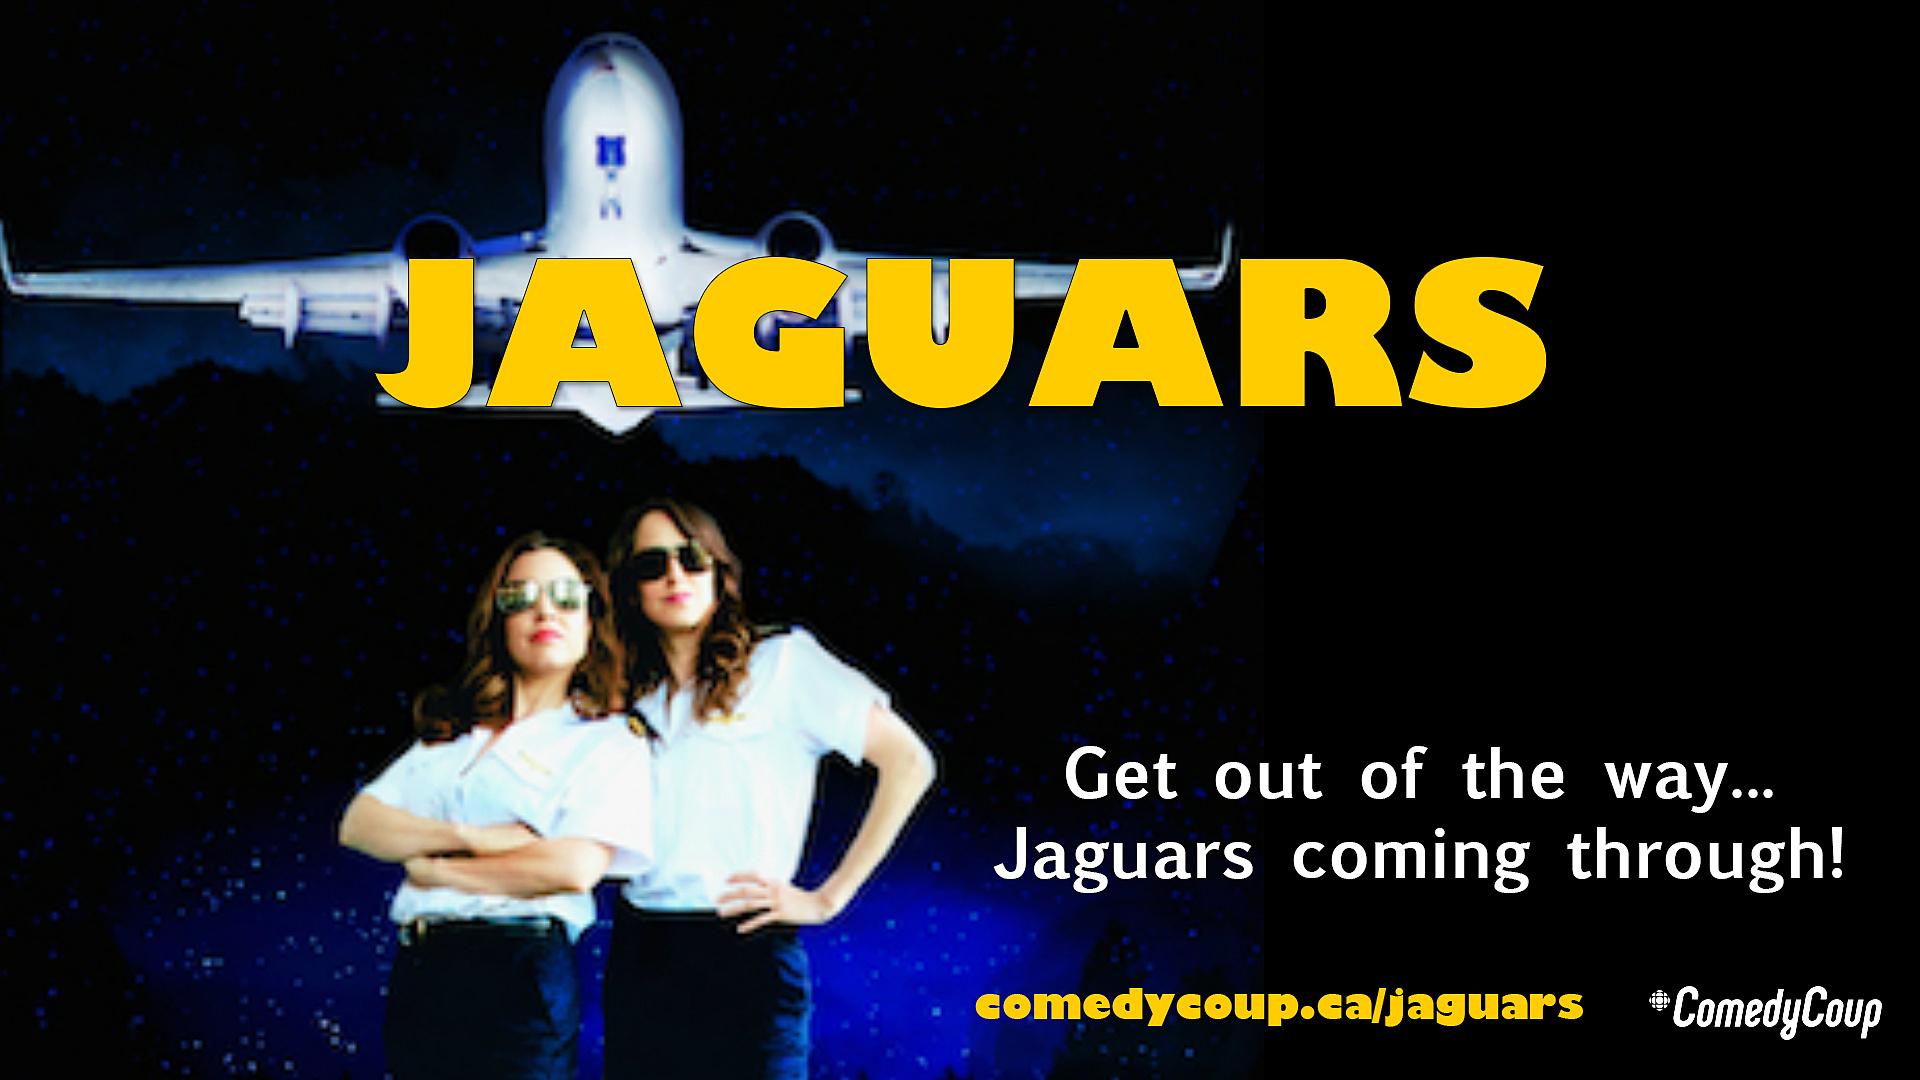 Week 4 Key It: Poster A Jaguars